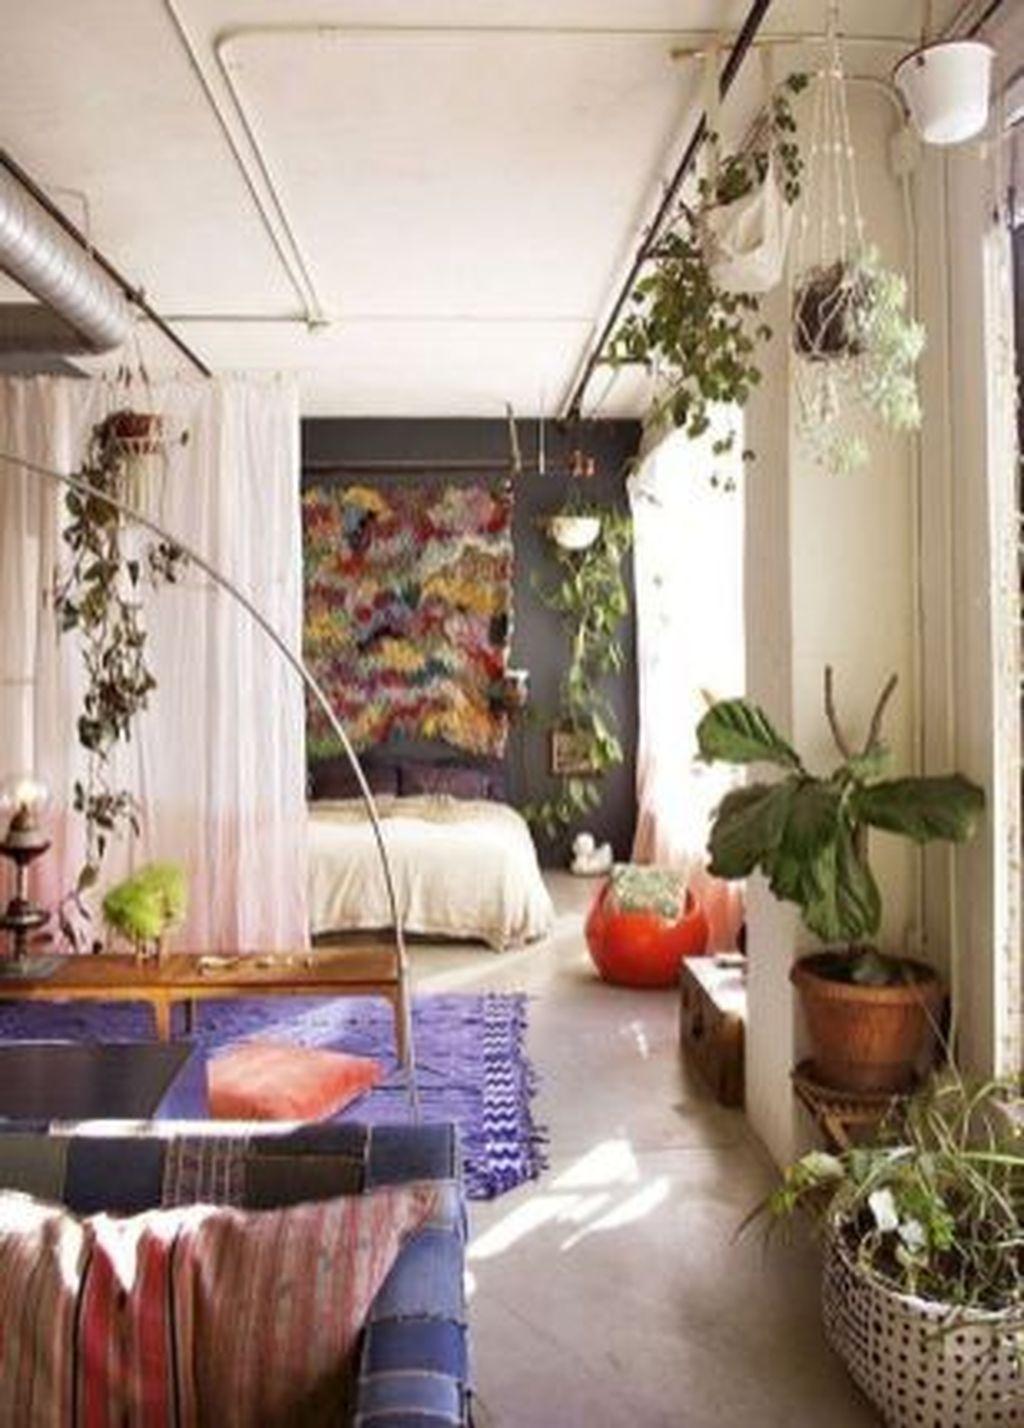 The Best Studio Apartment Layout Design Ideas 07